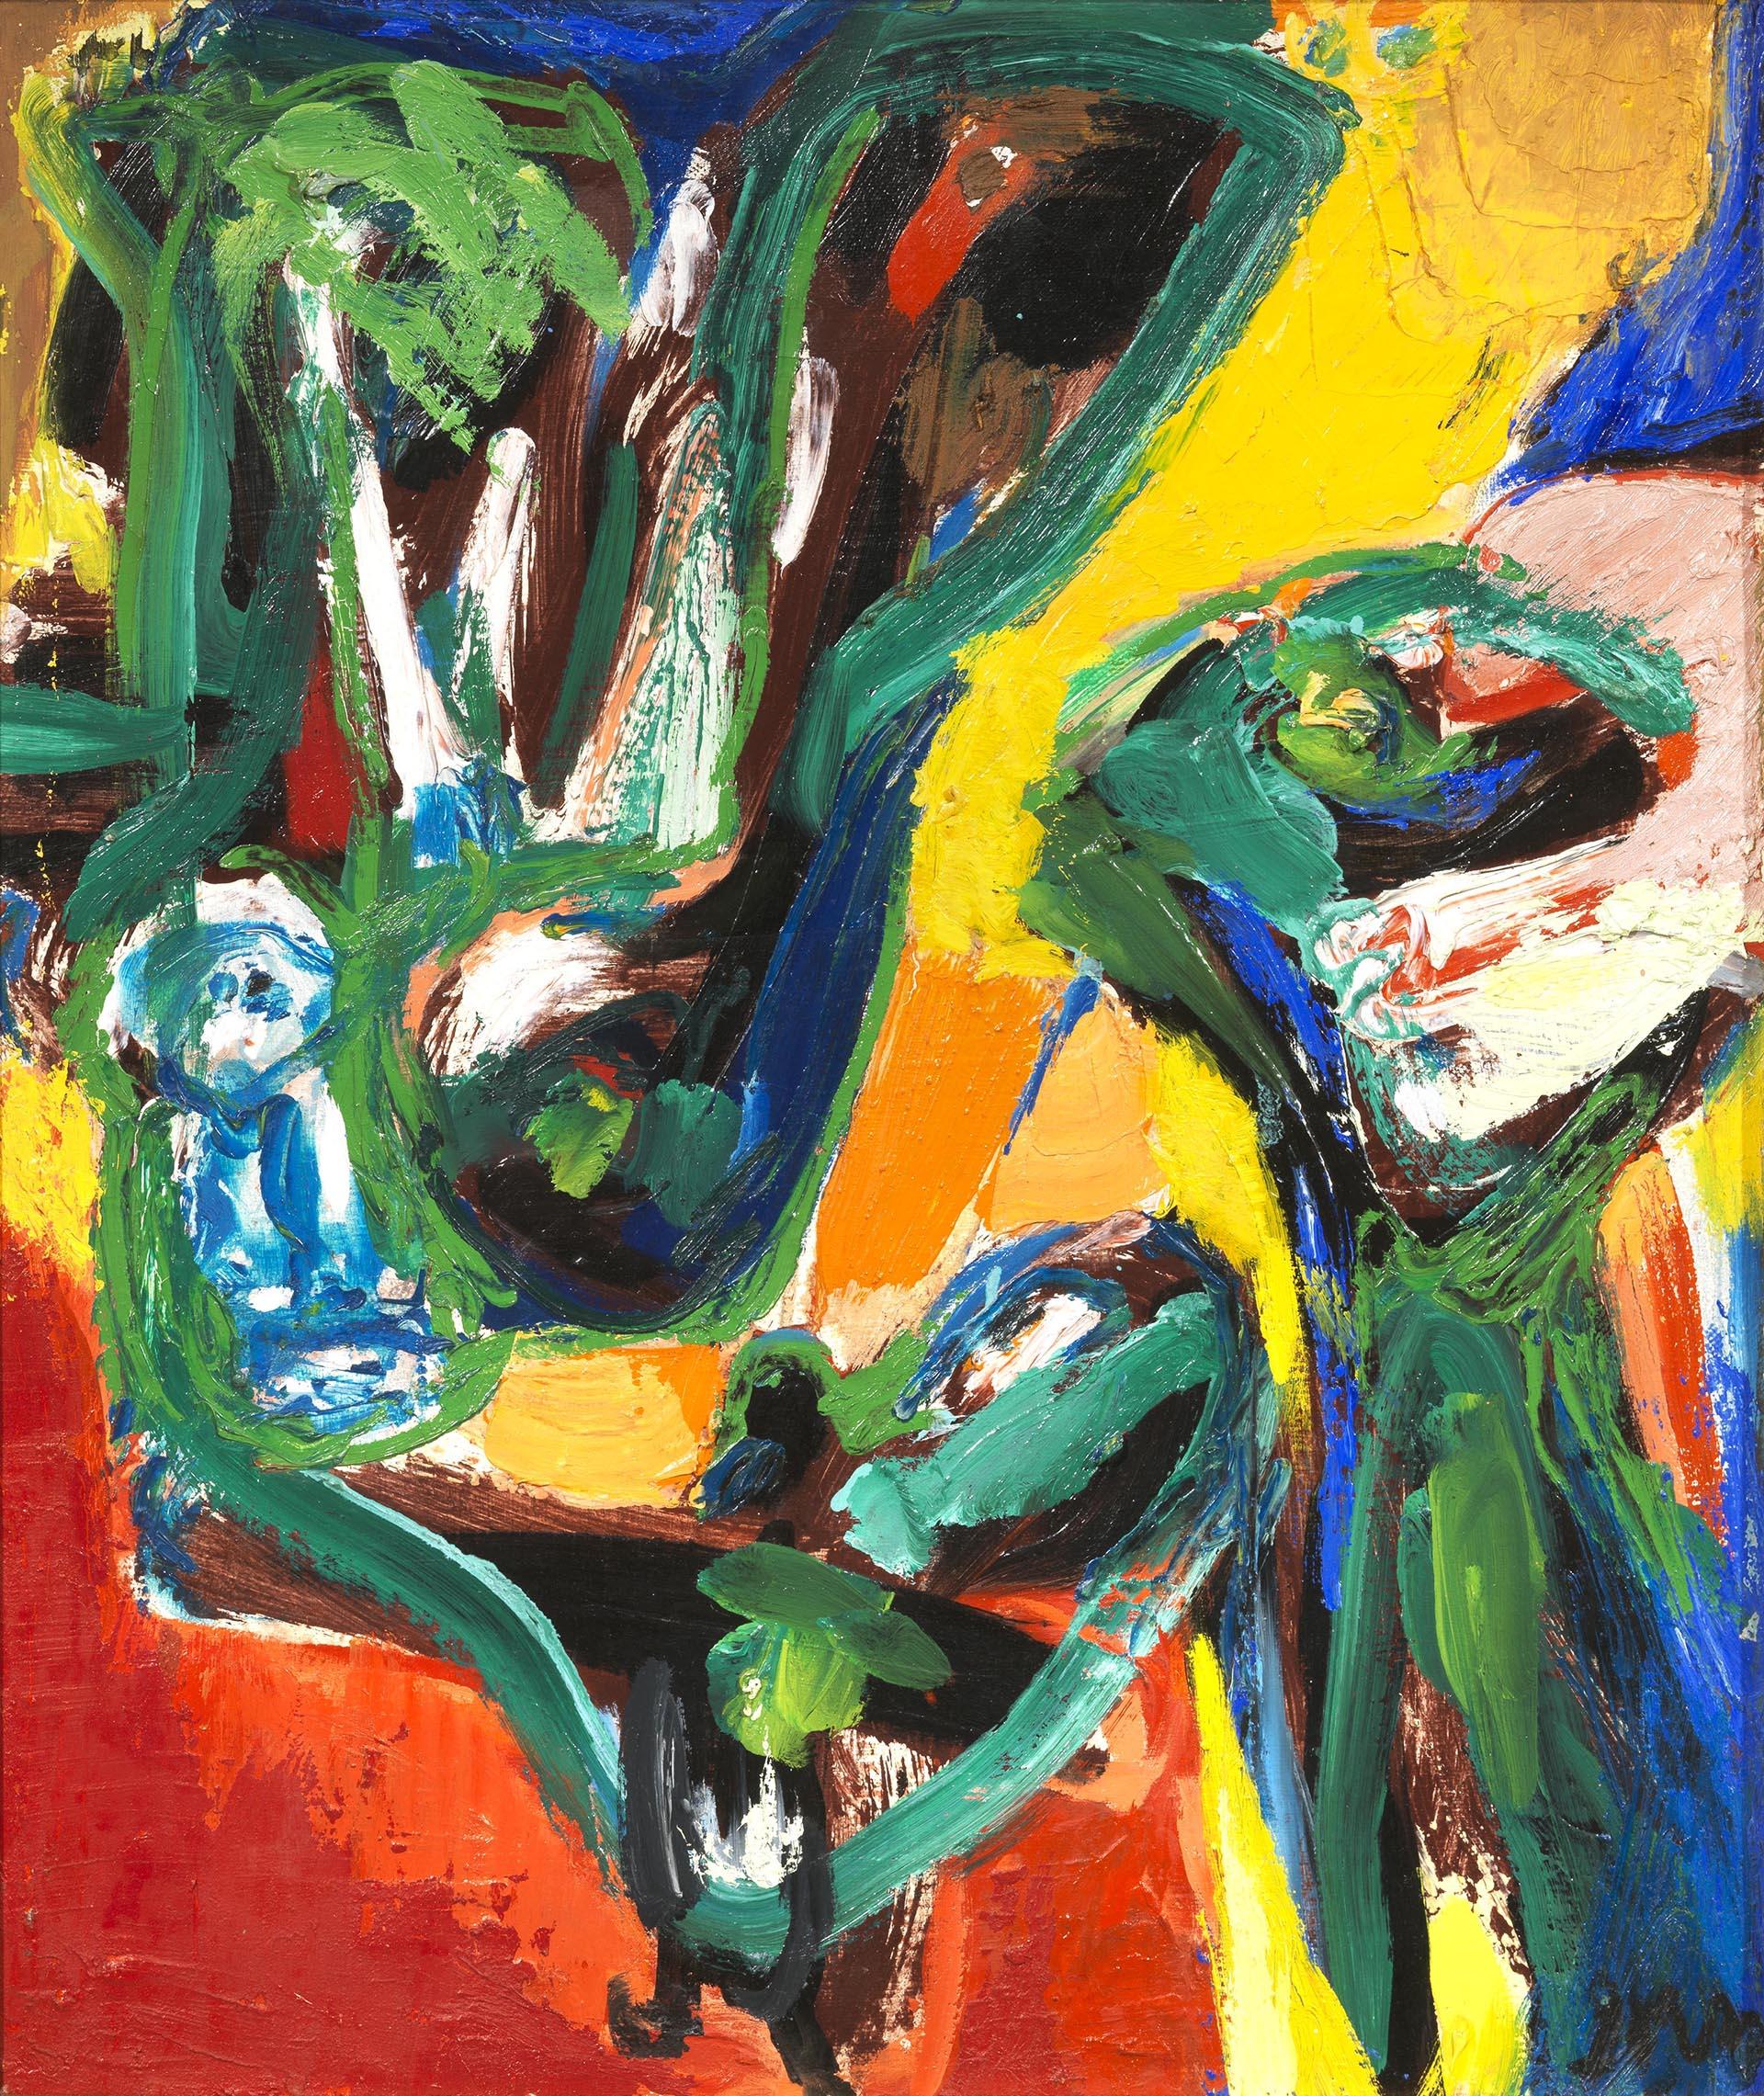 Jorn, Houm Souk, 1970-72, 55x46 cm